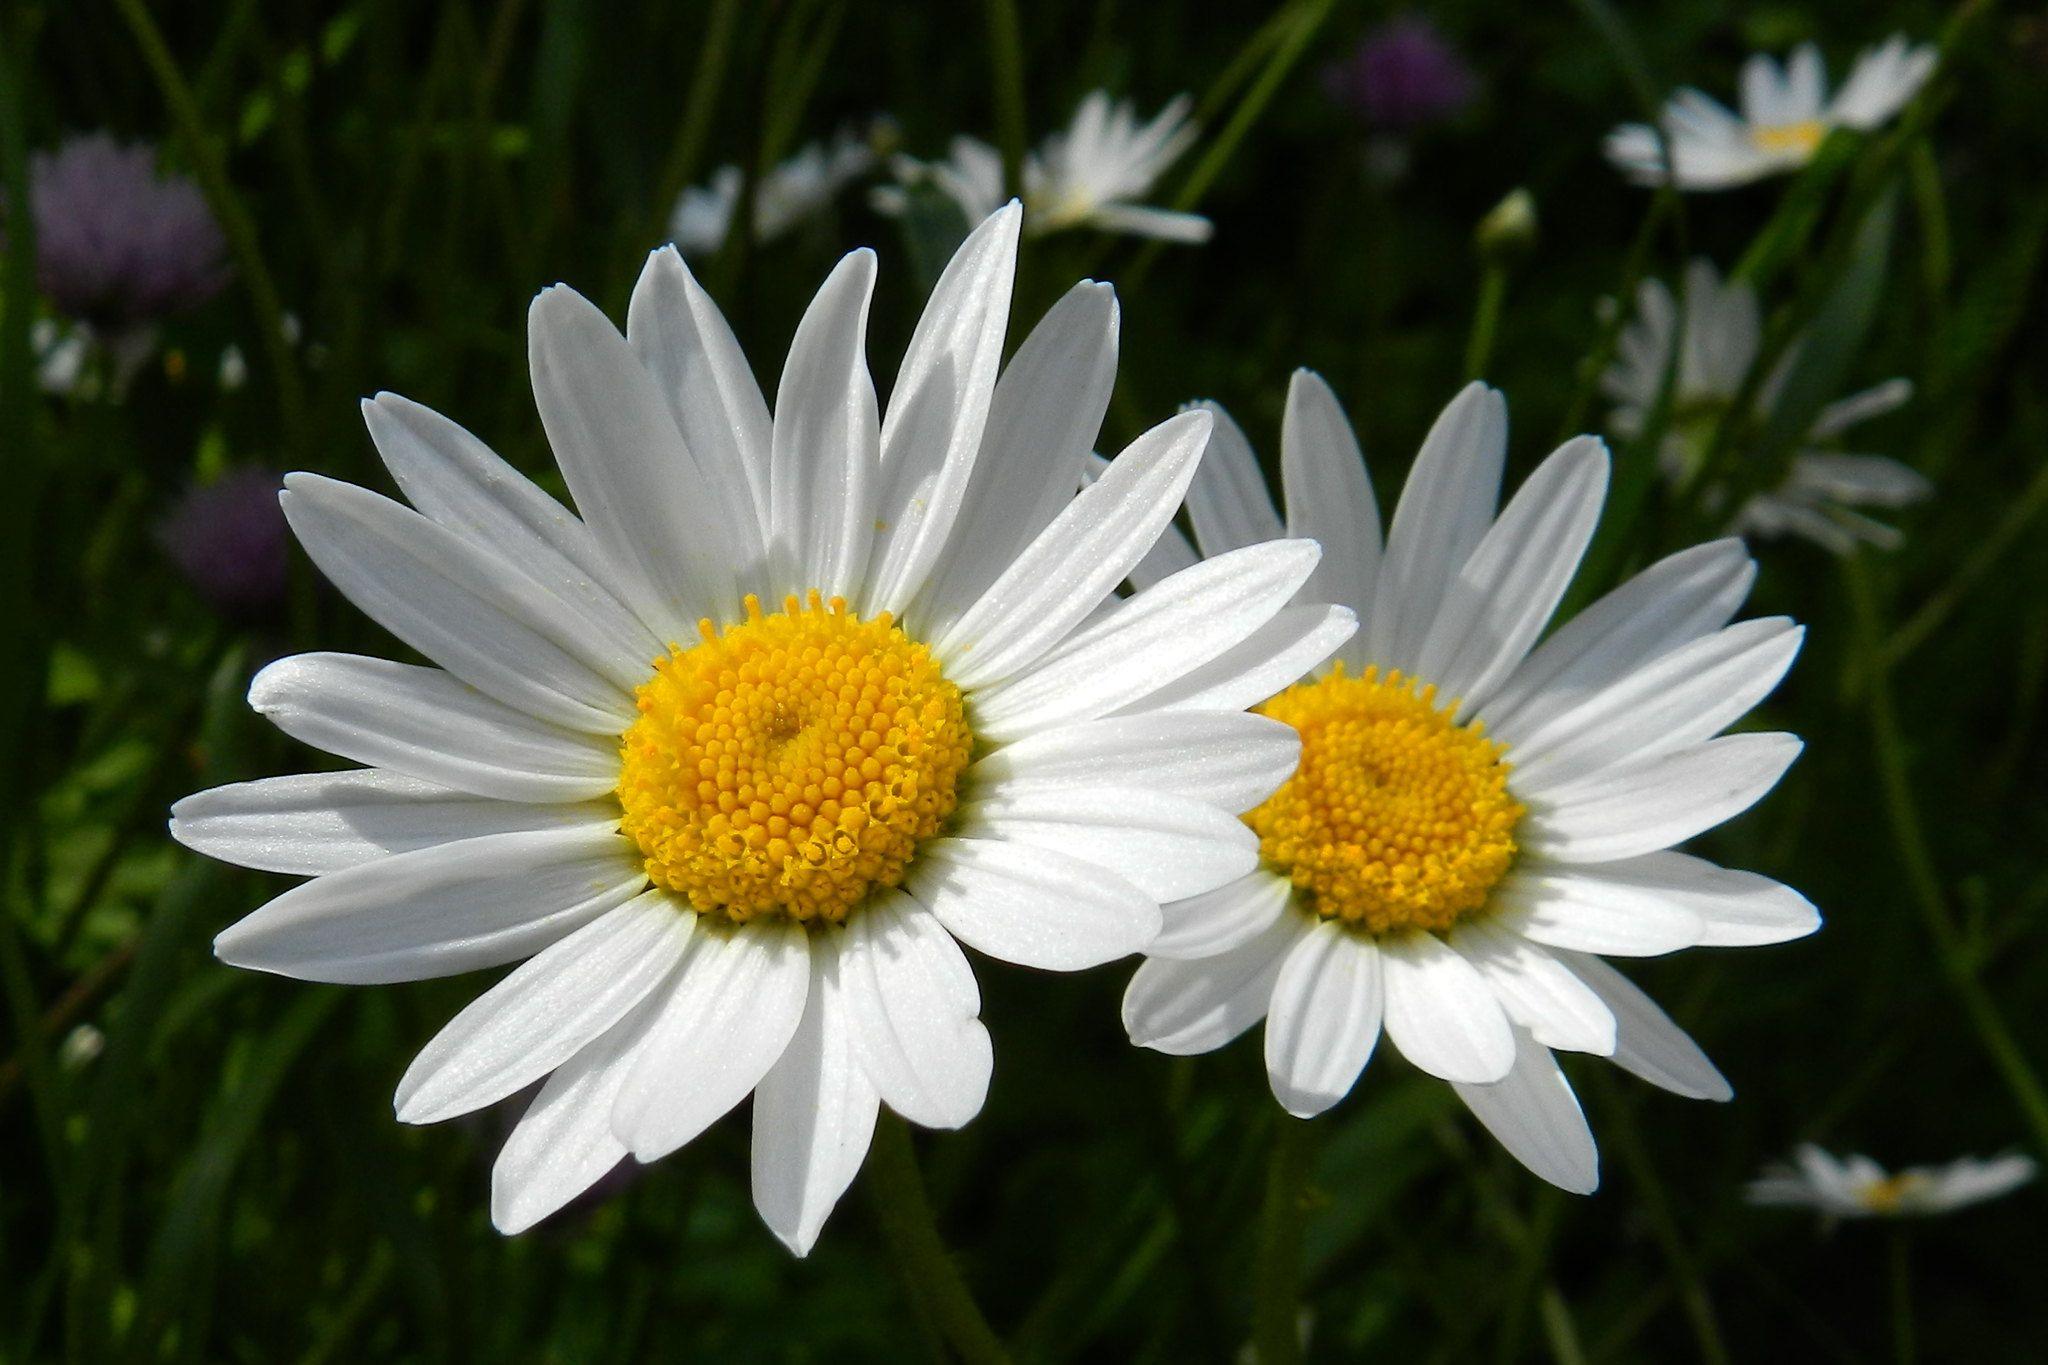 korean birth flower meaning